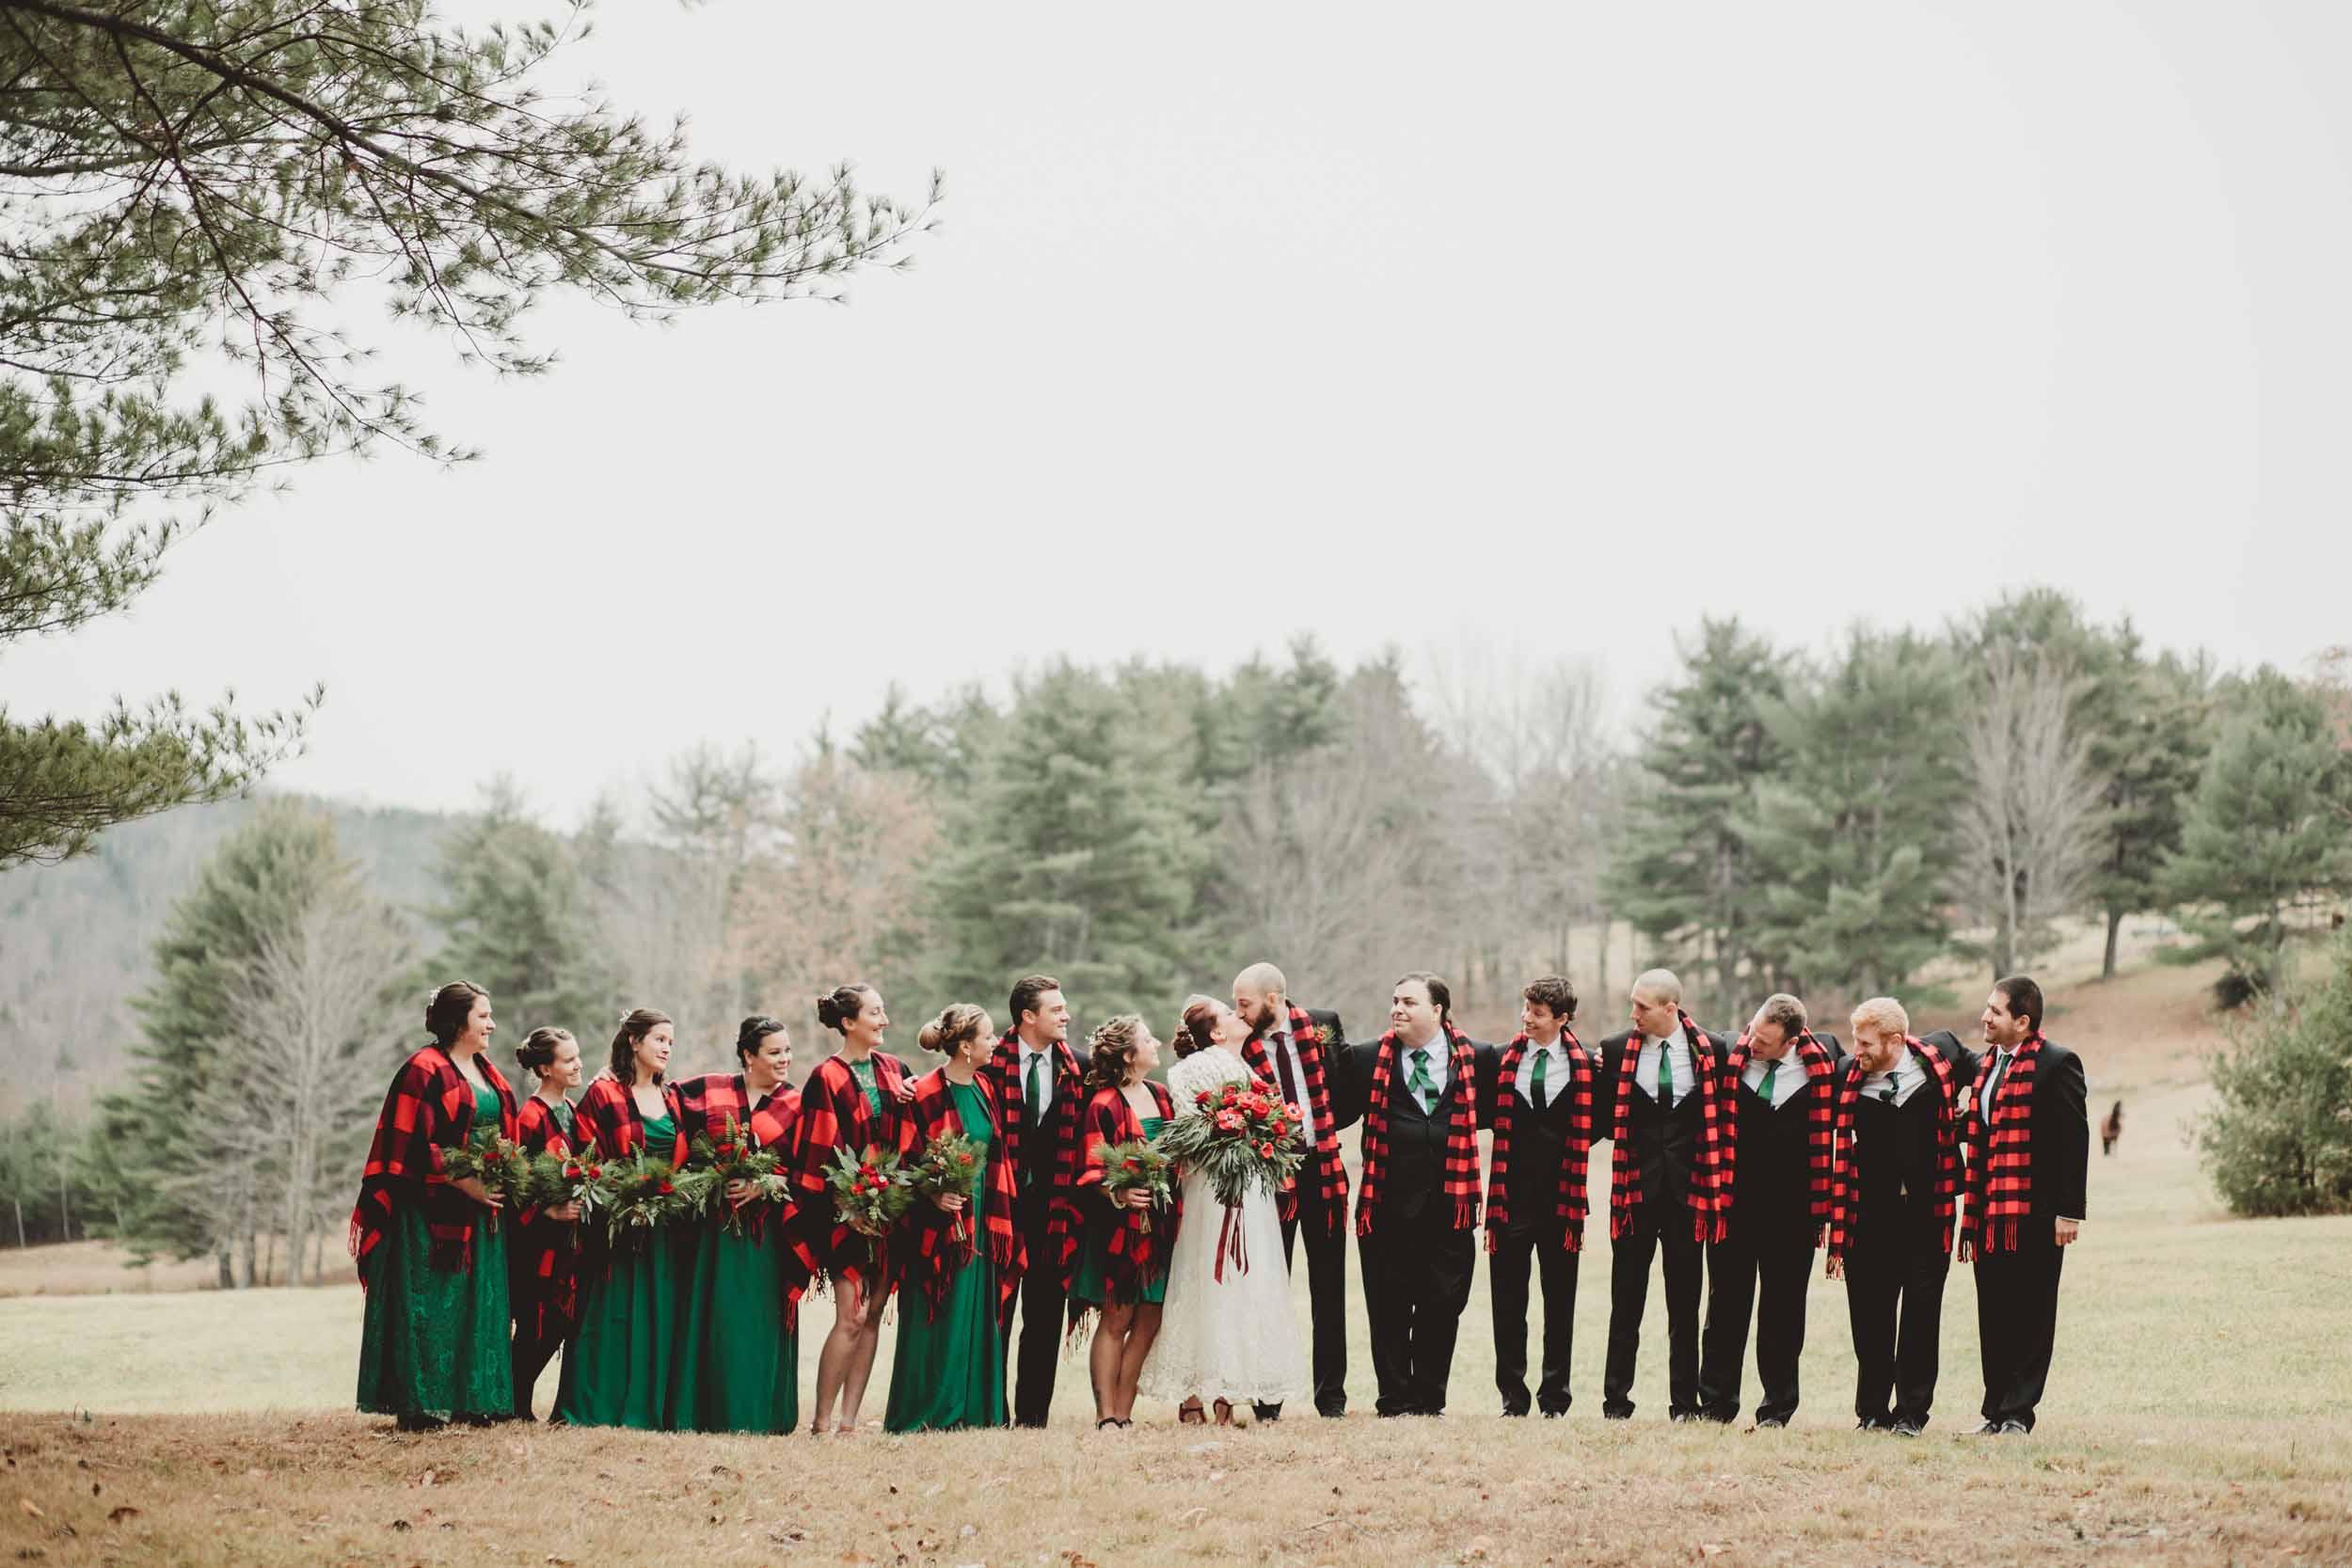 Stone-mountain-arts-wedding17.jpg